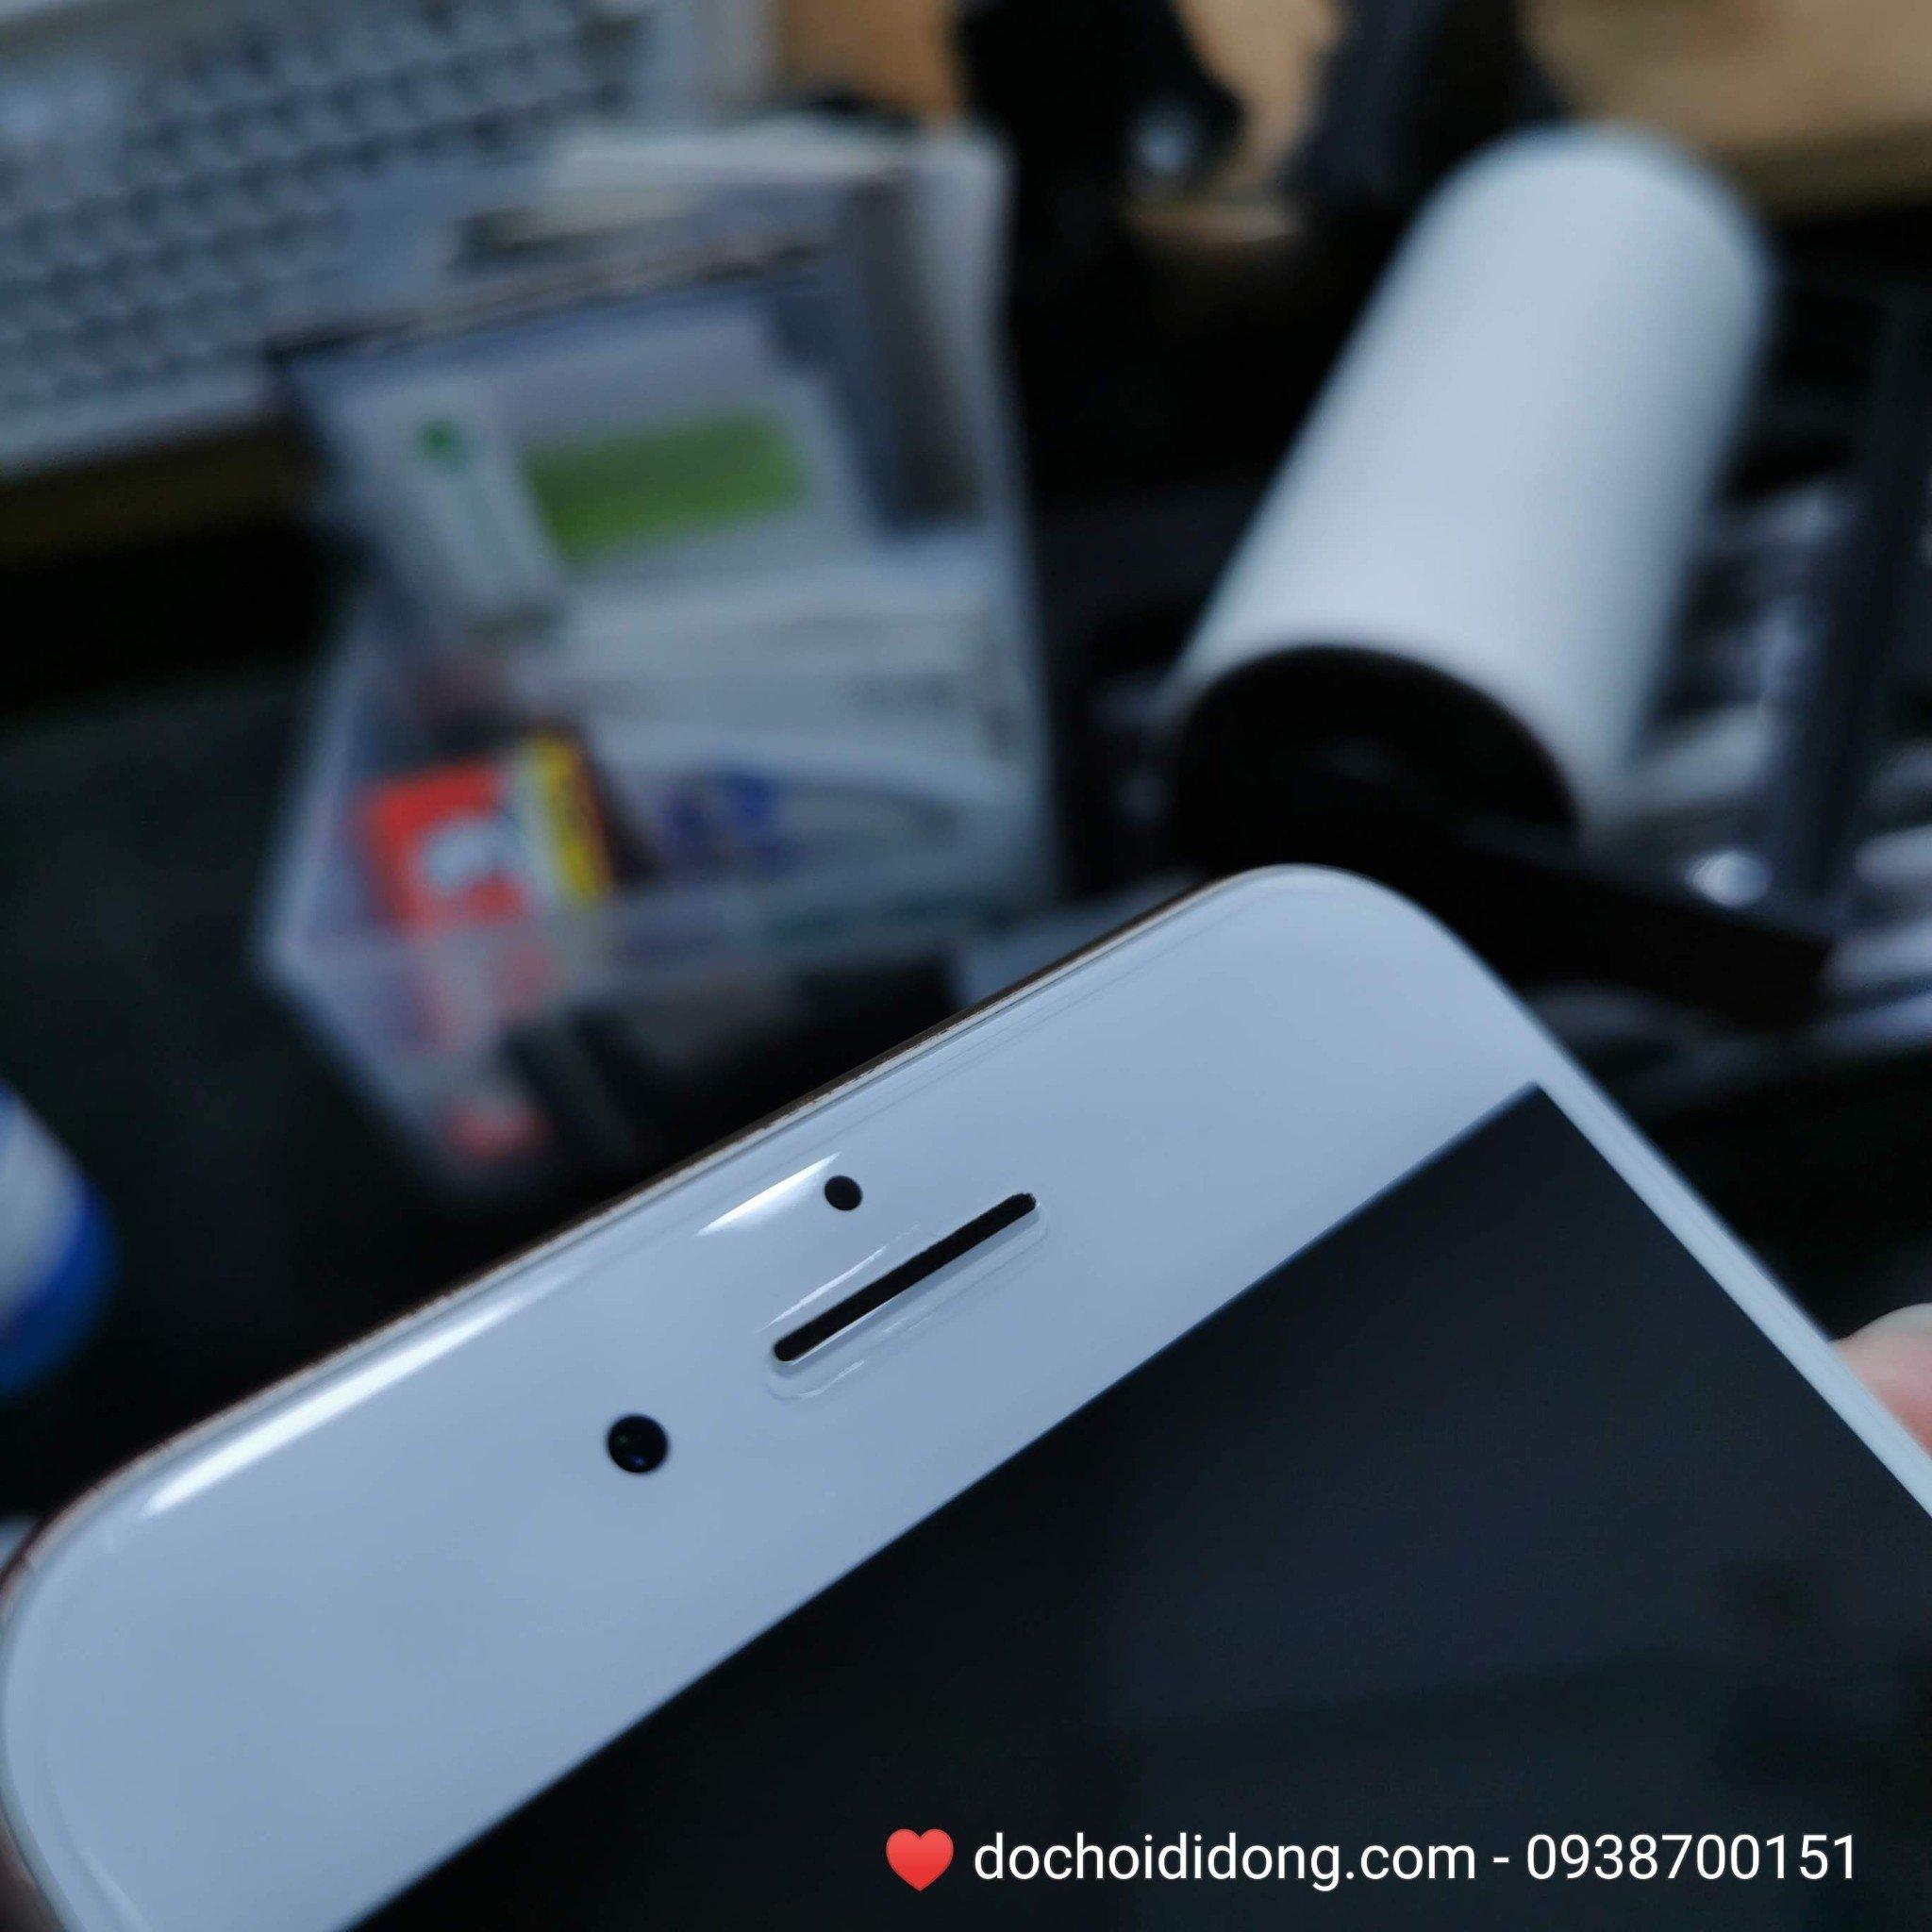 mieng-dan-ppf-rock-iphone-8-plus-trong-nham-doi-mau-cao-cap